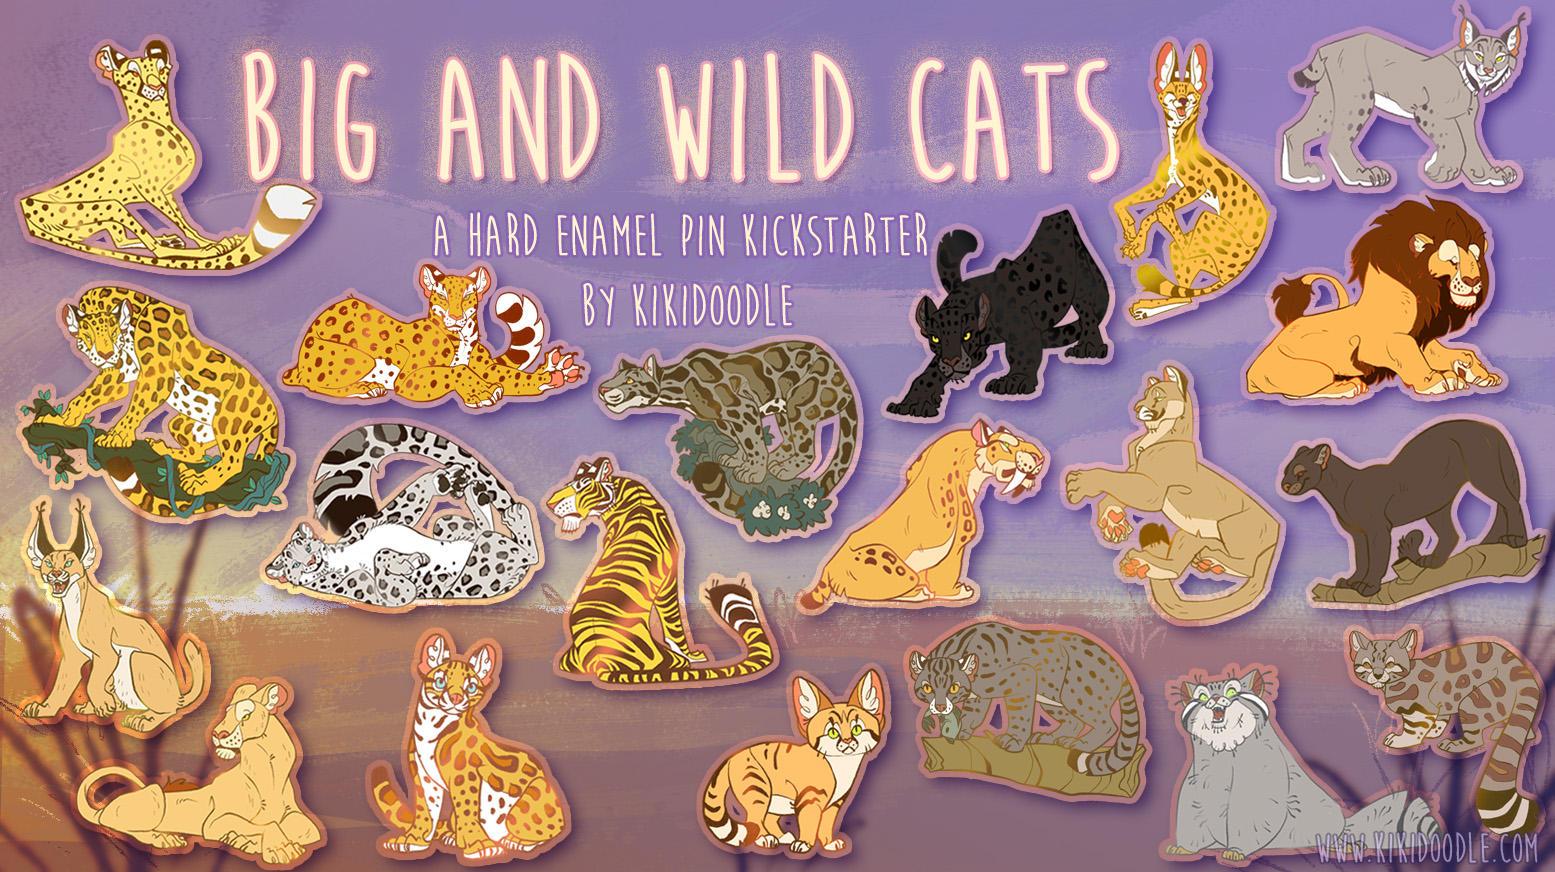 2 days left in Big And Wild Cat Kickstarter by kiki-doodle